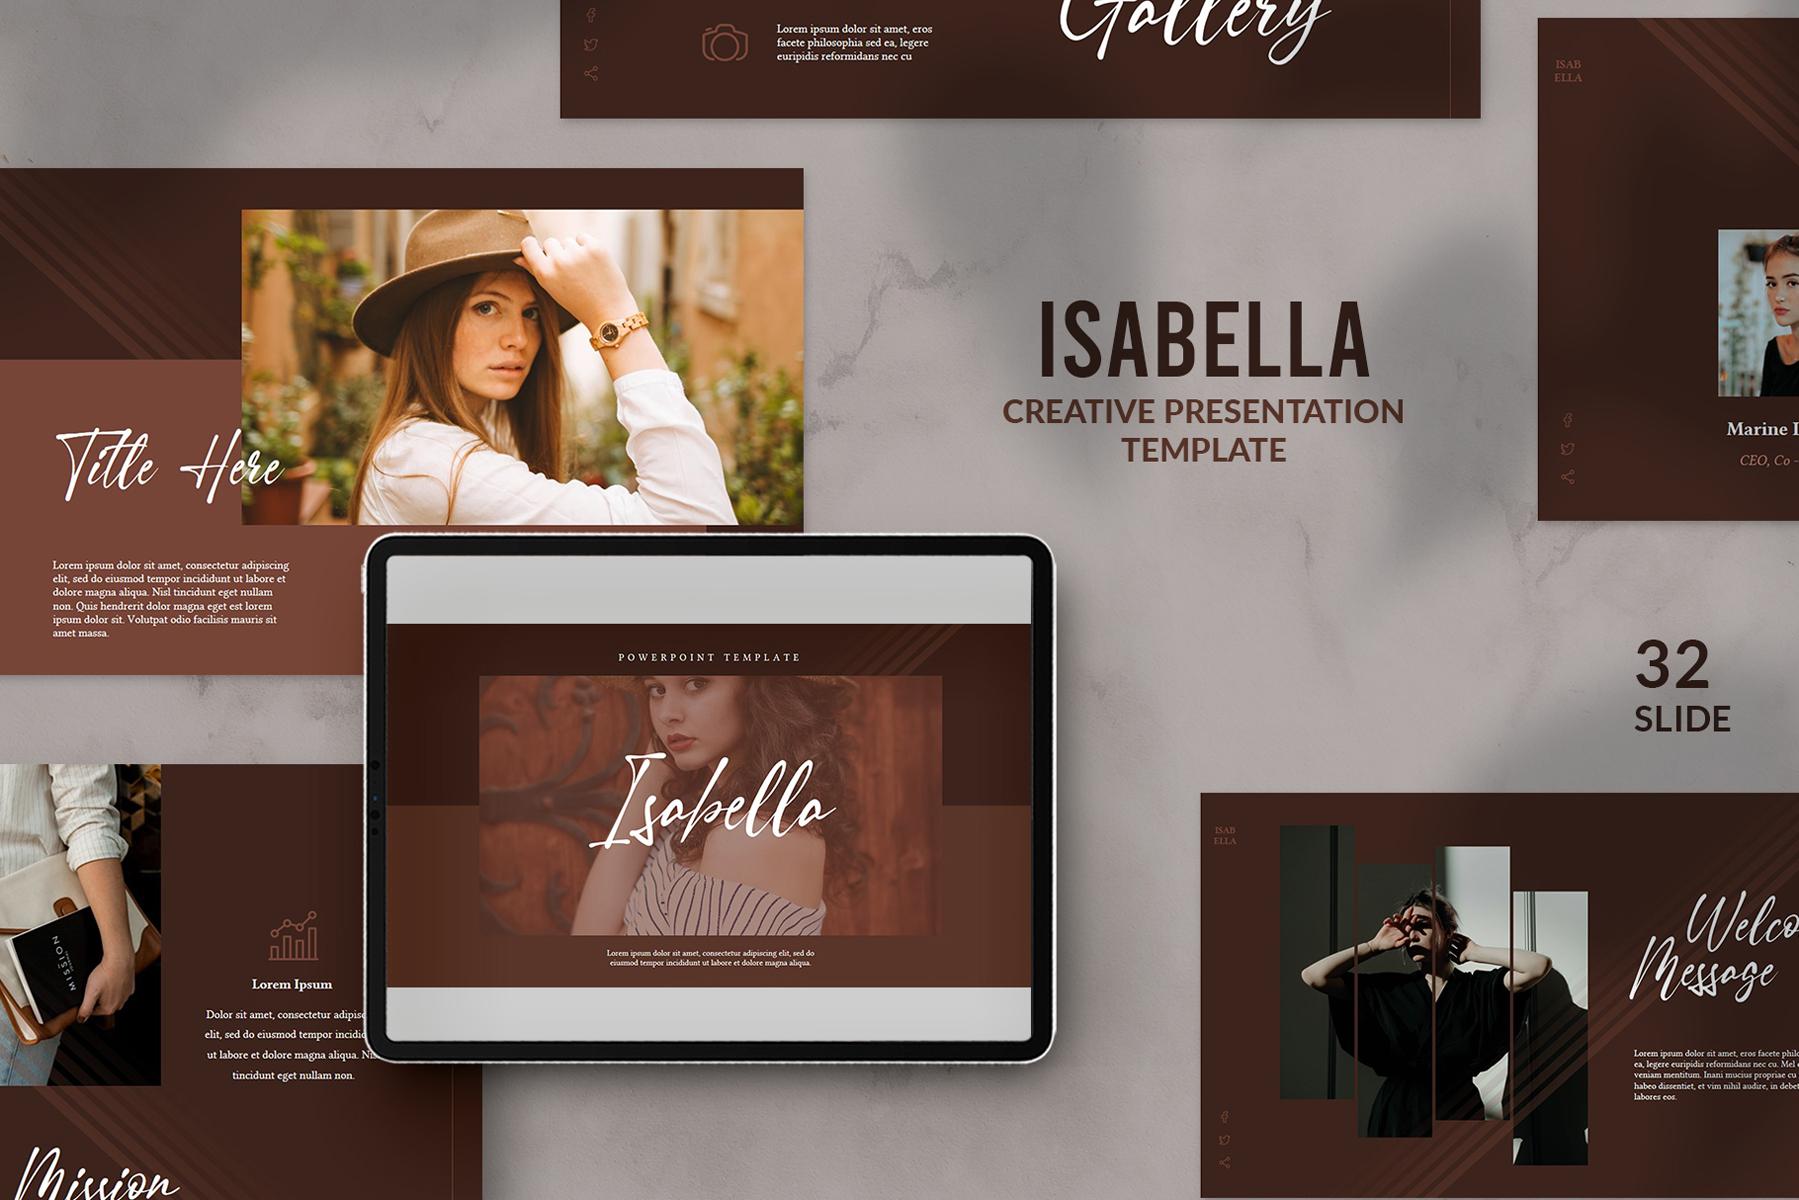 Isabella Presentation PowerPoint Template